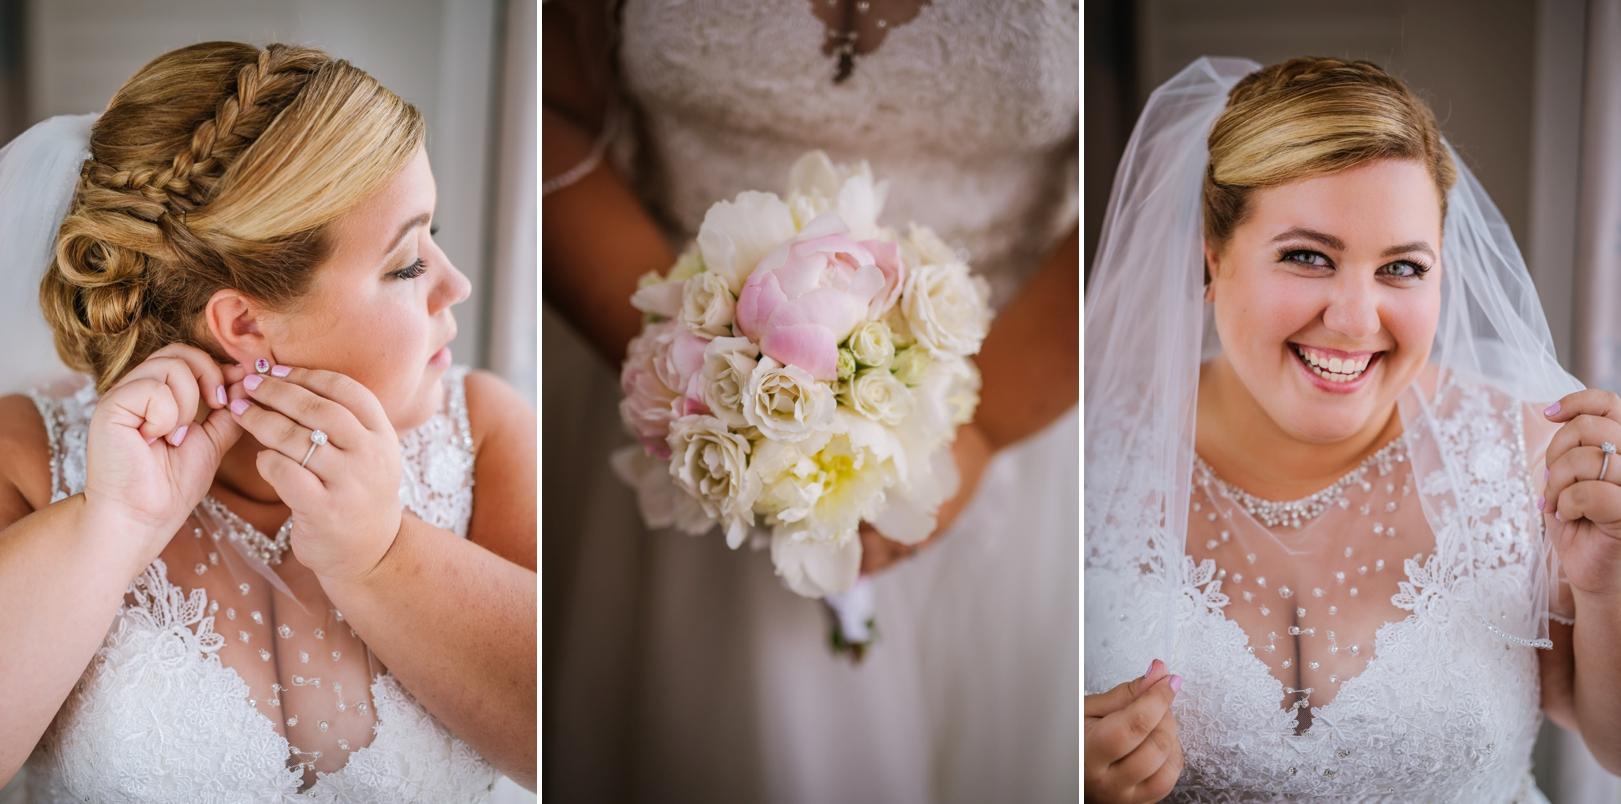 St-pete-wedding-photographer-don-caesar-ashlee-hamon_0009.jpg